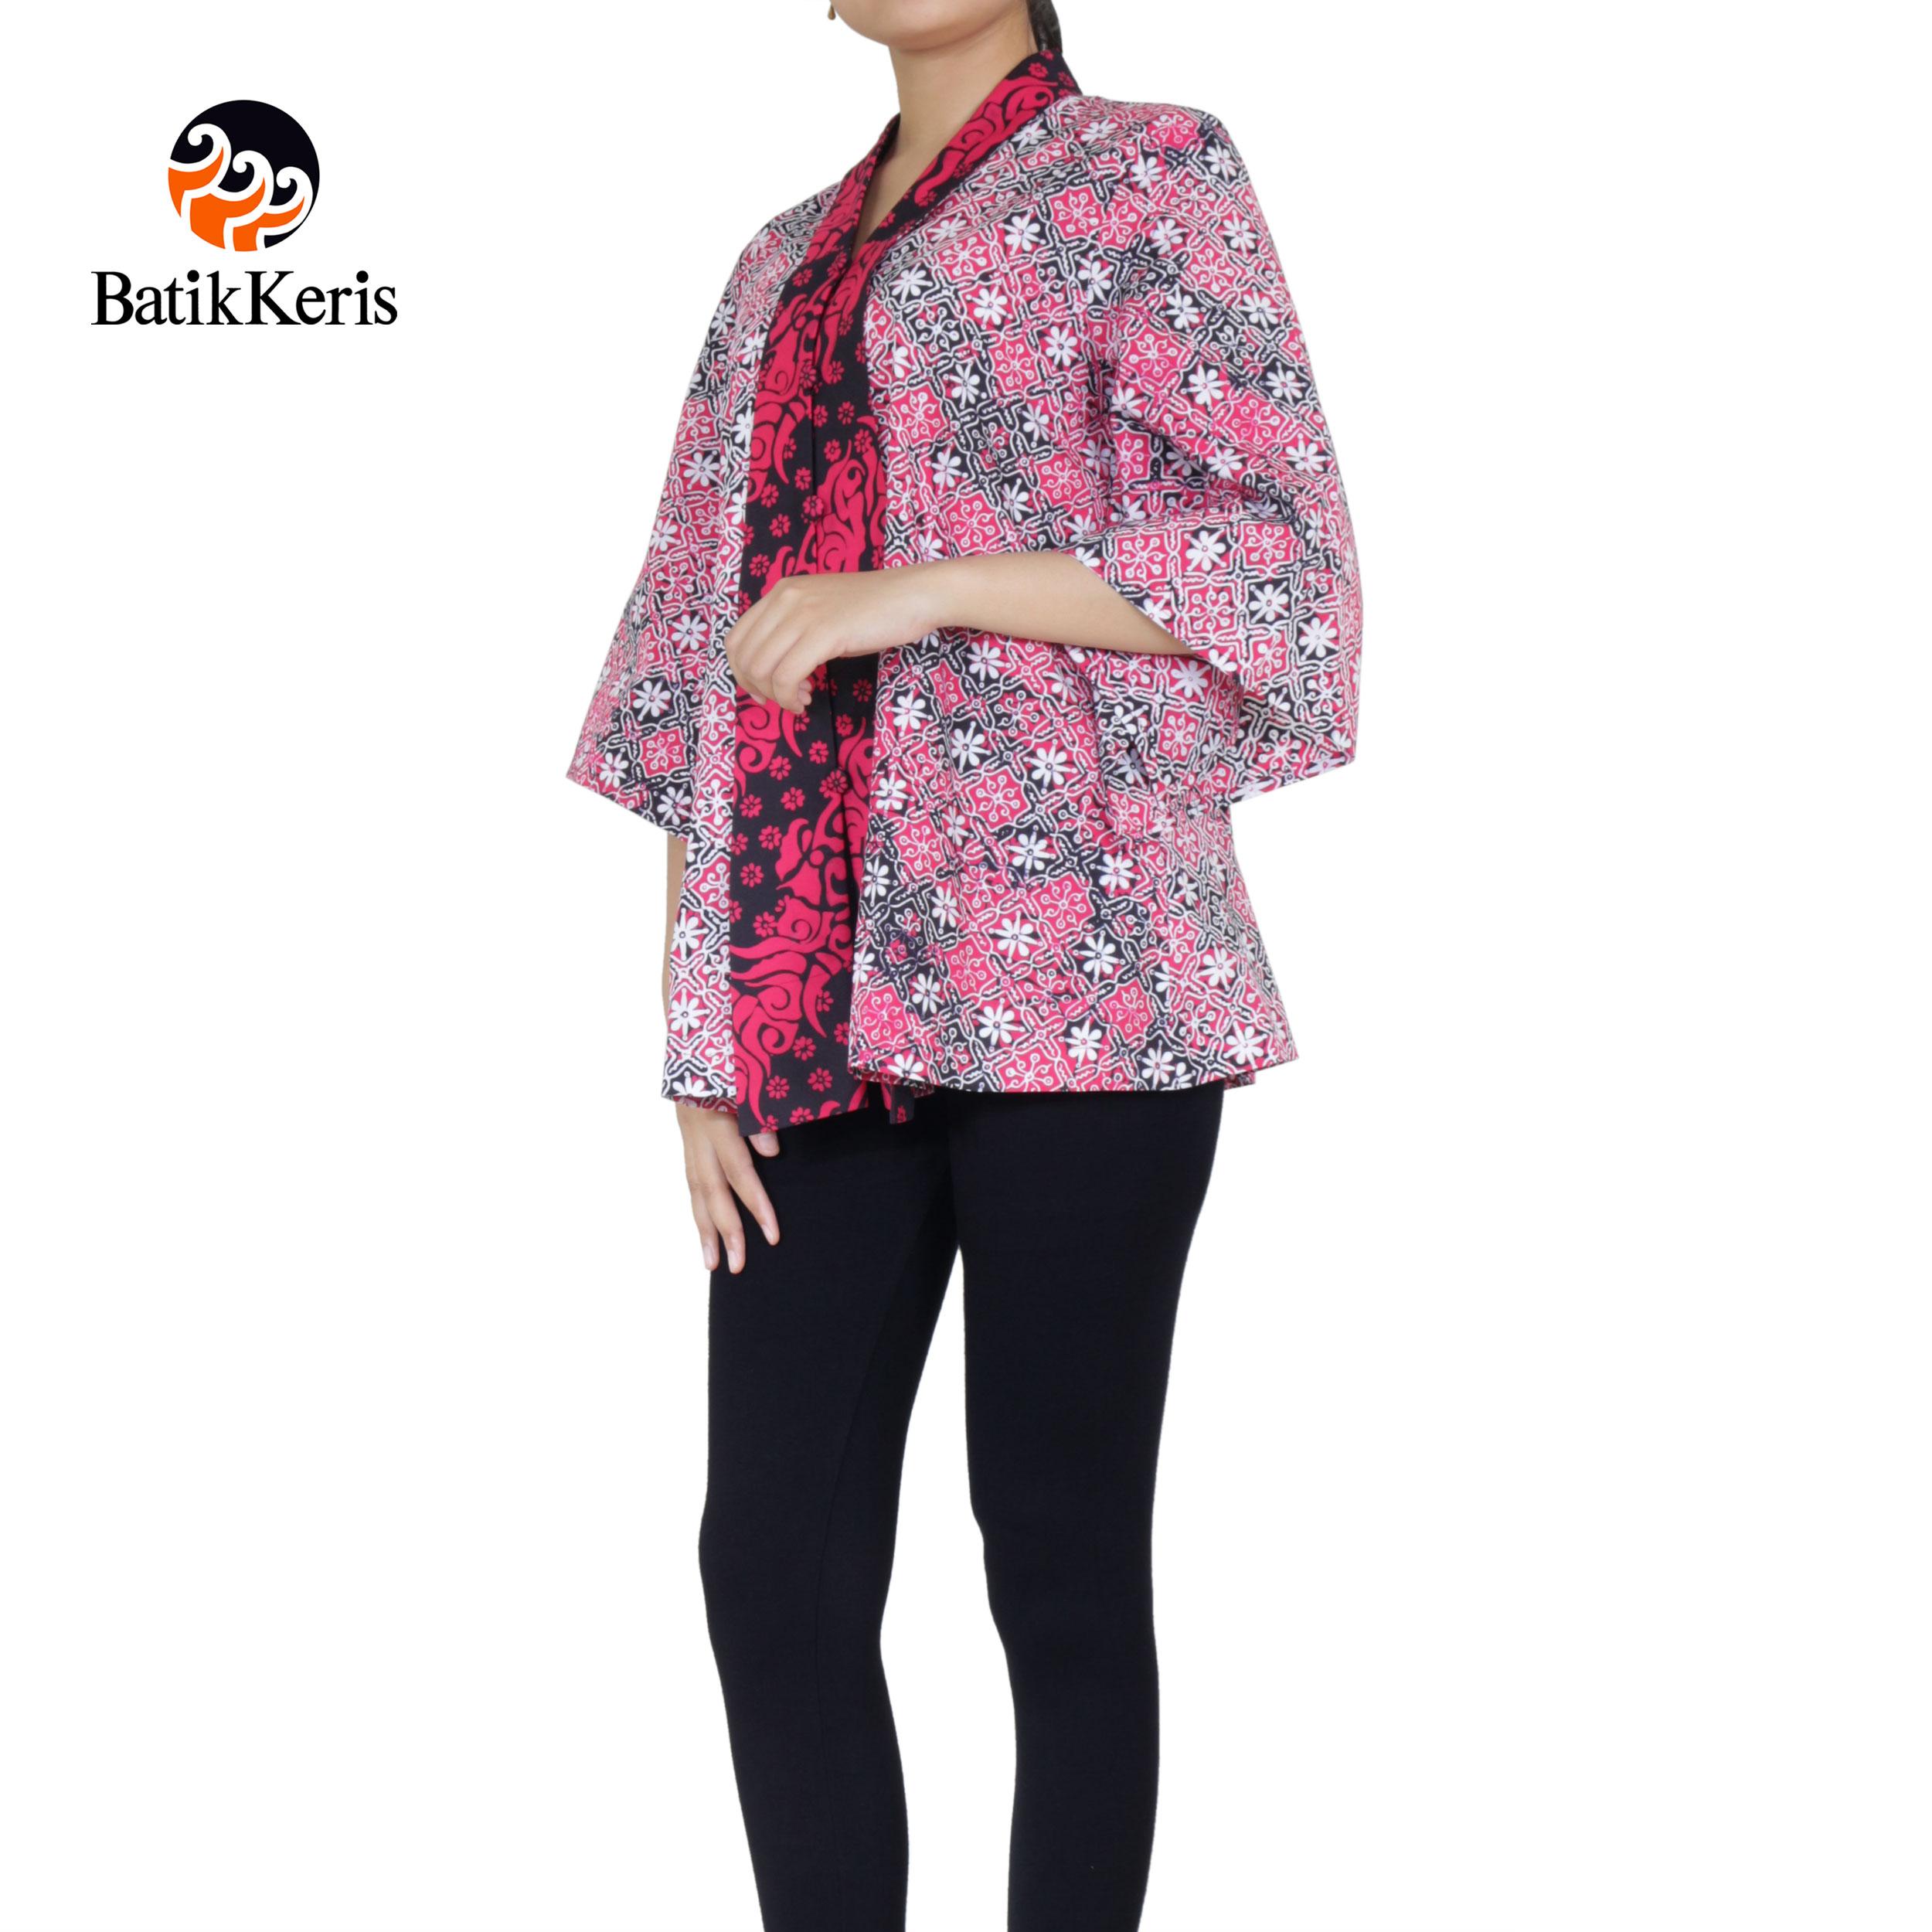 Batik Keris Online » BLOUSE BATIK MOTIF SEKAR CEPLOK KOMBINASI MEGA ... 3174548eb4